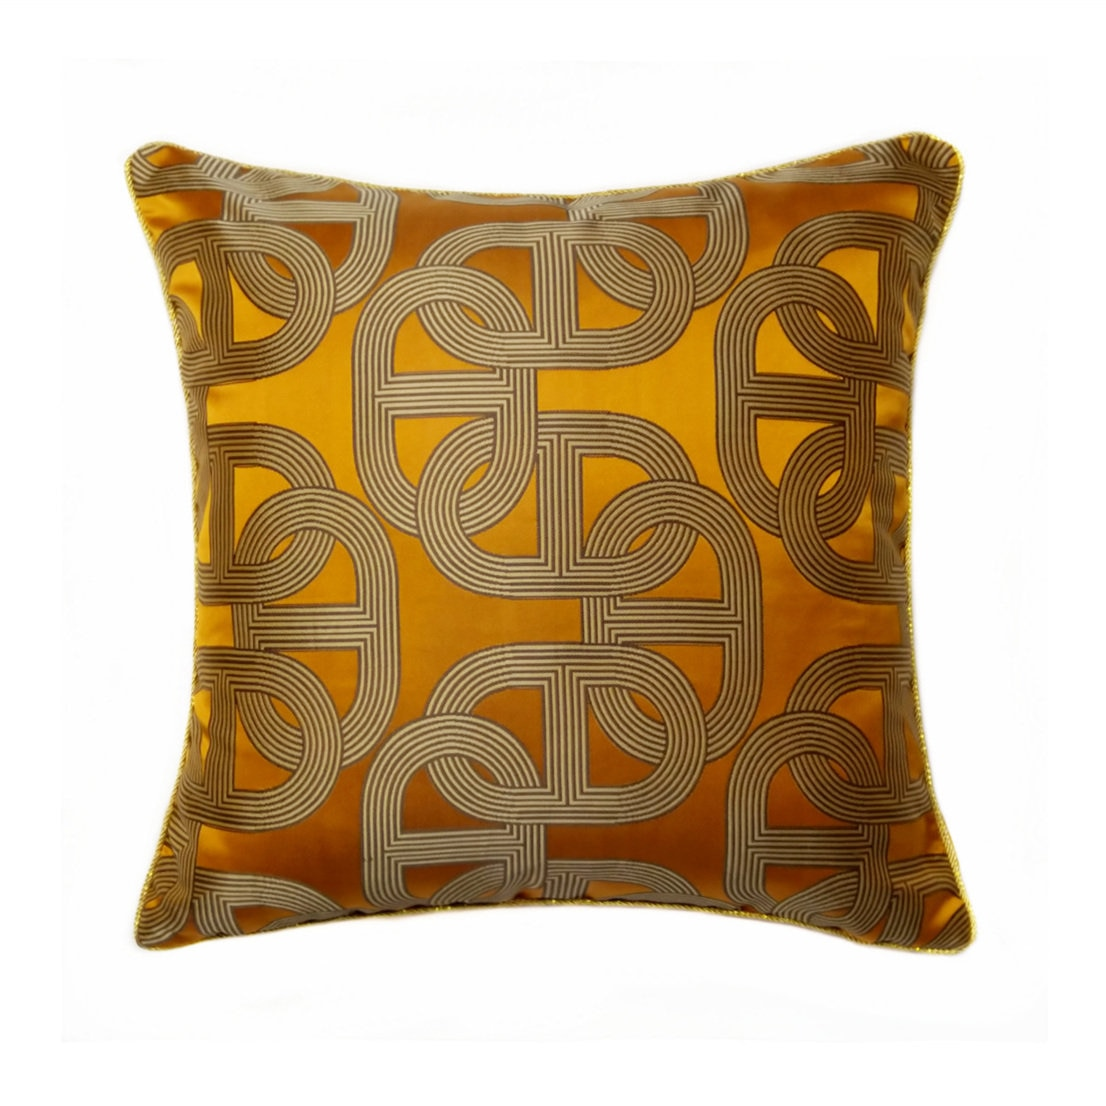 Amerikaanse Luxe Gold Kussensloop Geometrische Jacquard Sofa Decoratieve Kussenhoes 30X50 Cm Auto Taille Kussenslopen Thuis deco